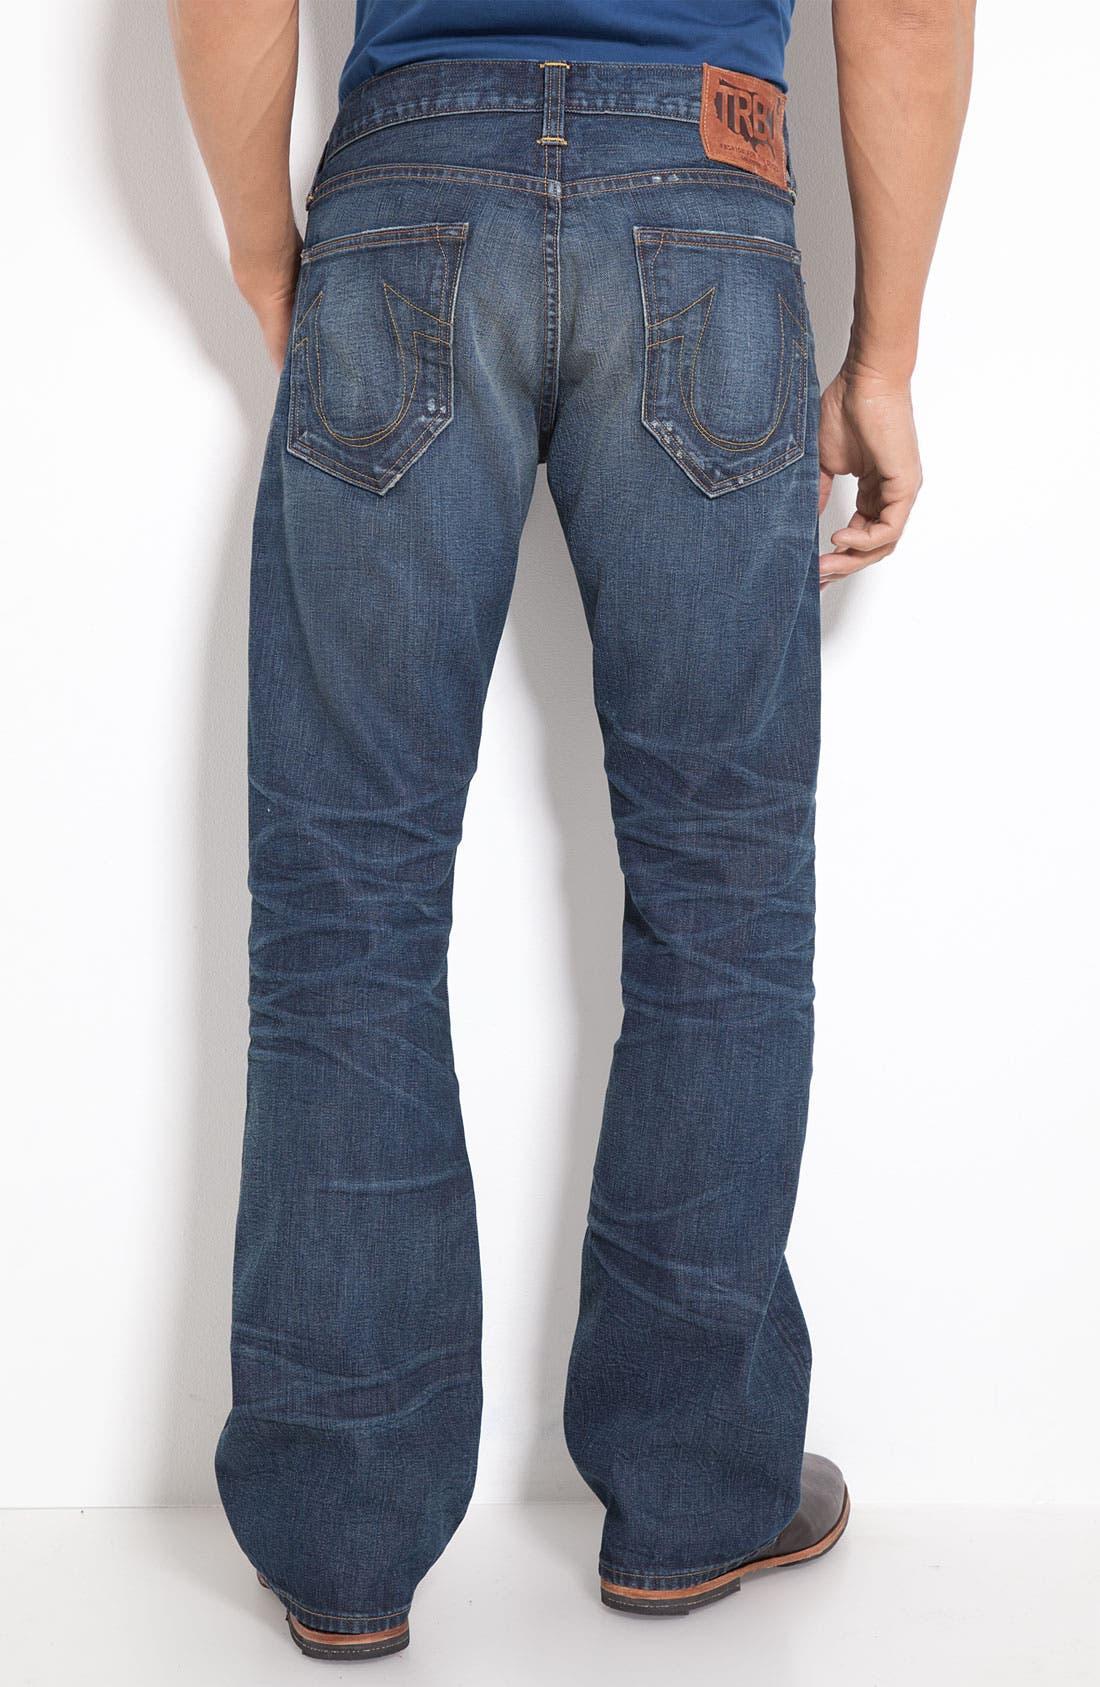 Main Image - True Religion Brand Jeans 'Danny Phoenix' Bootcut Jeans (Blue Grass)